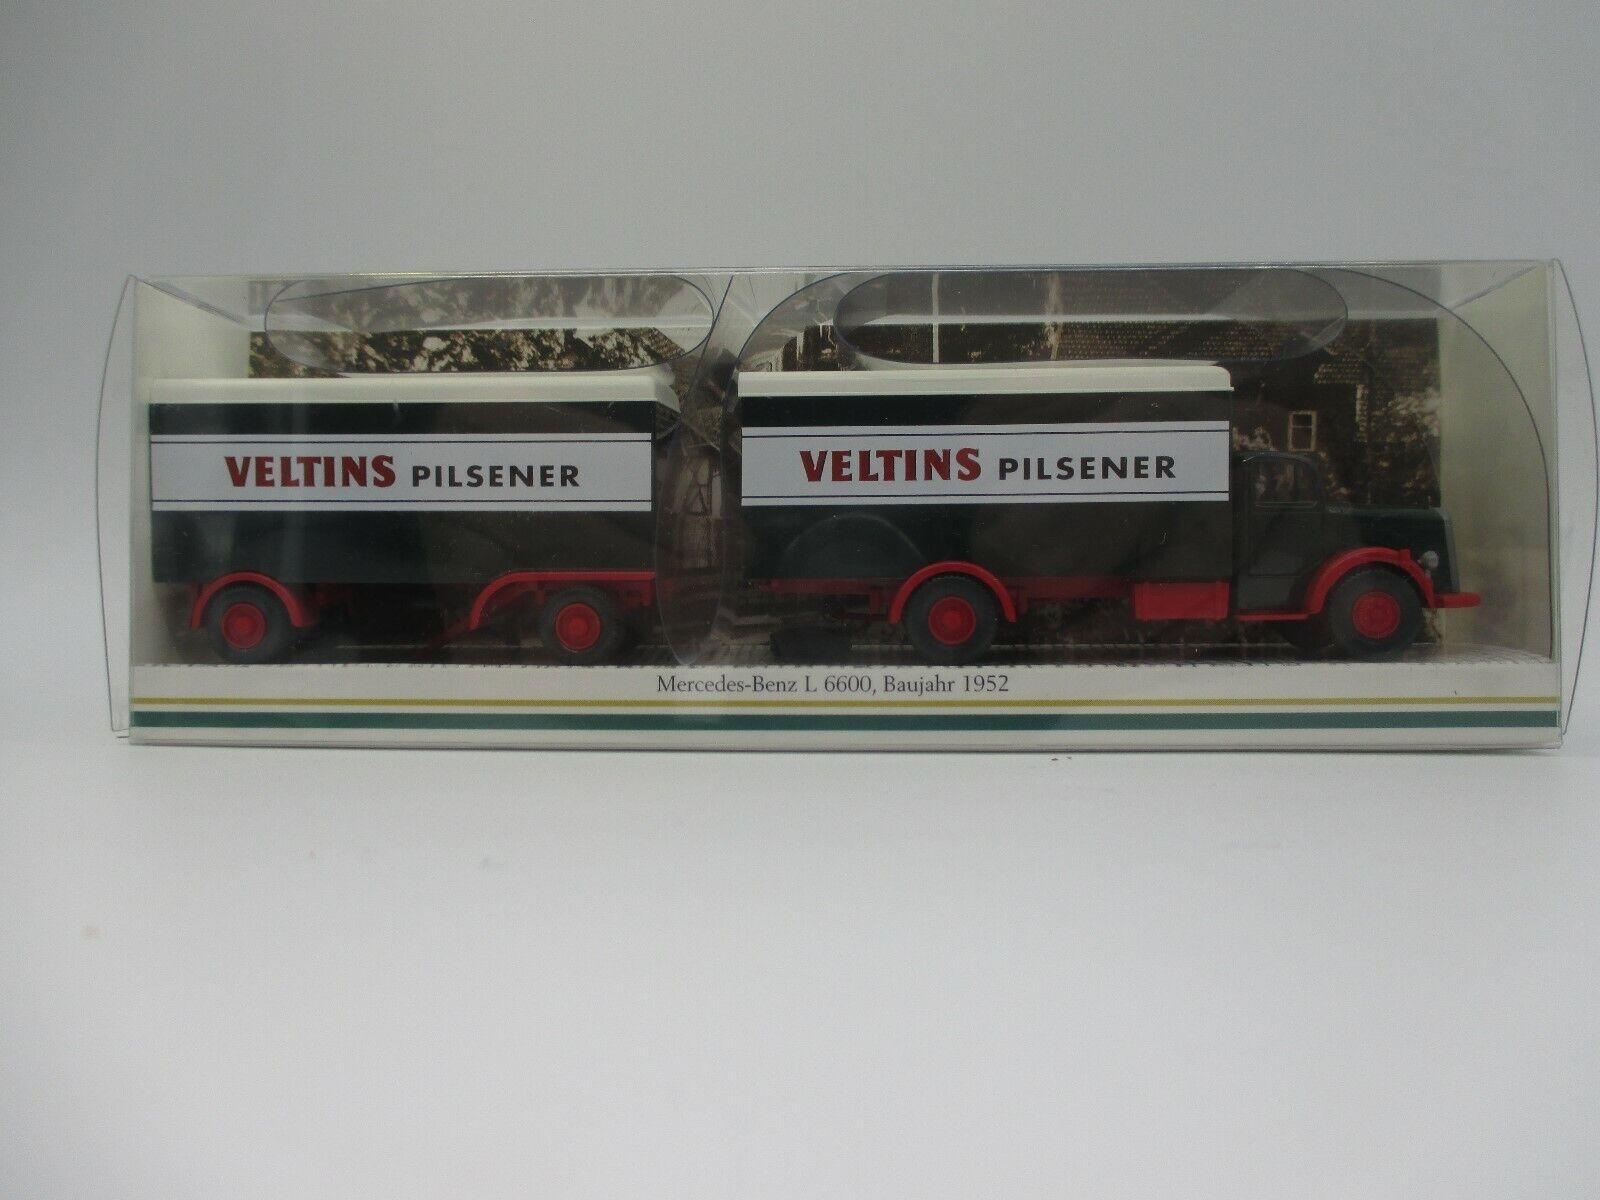 Wire  MB l6600 Tappetinohängerzug Veltins Pilsener modellololo pubblicitari gk104